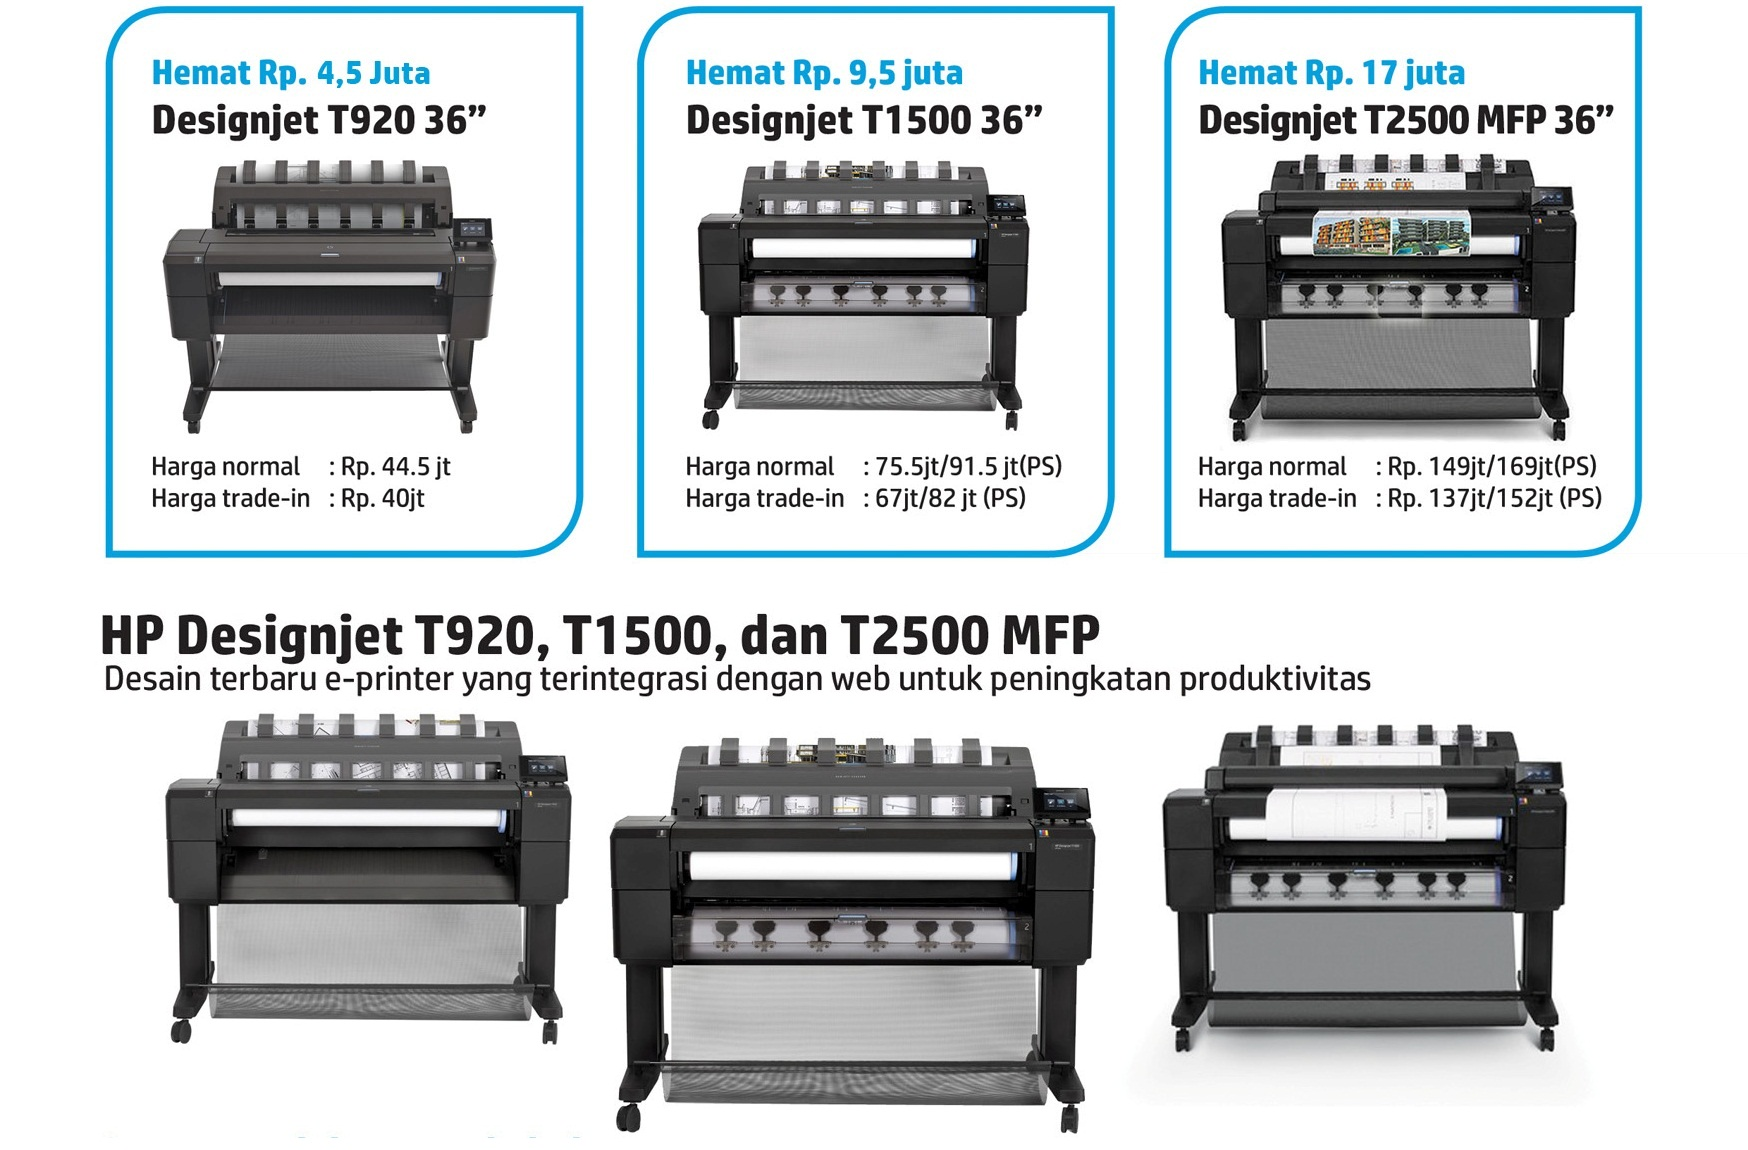 gambar Hp-Designjet-T920-T1500-e-printer-dan-T2500-e-MFP-Printer-middle1